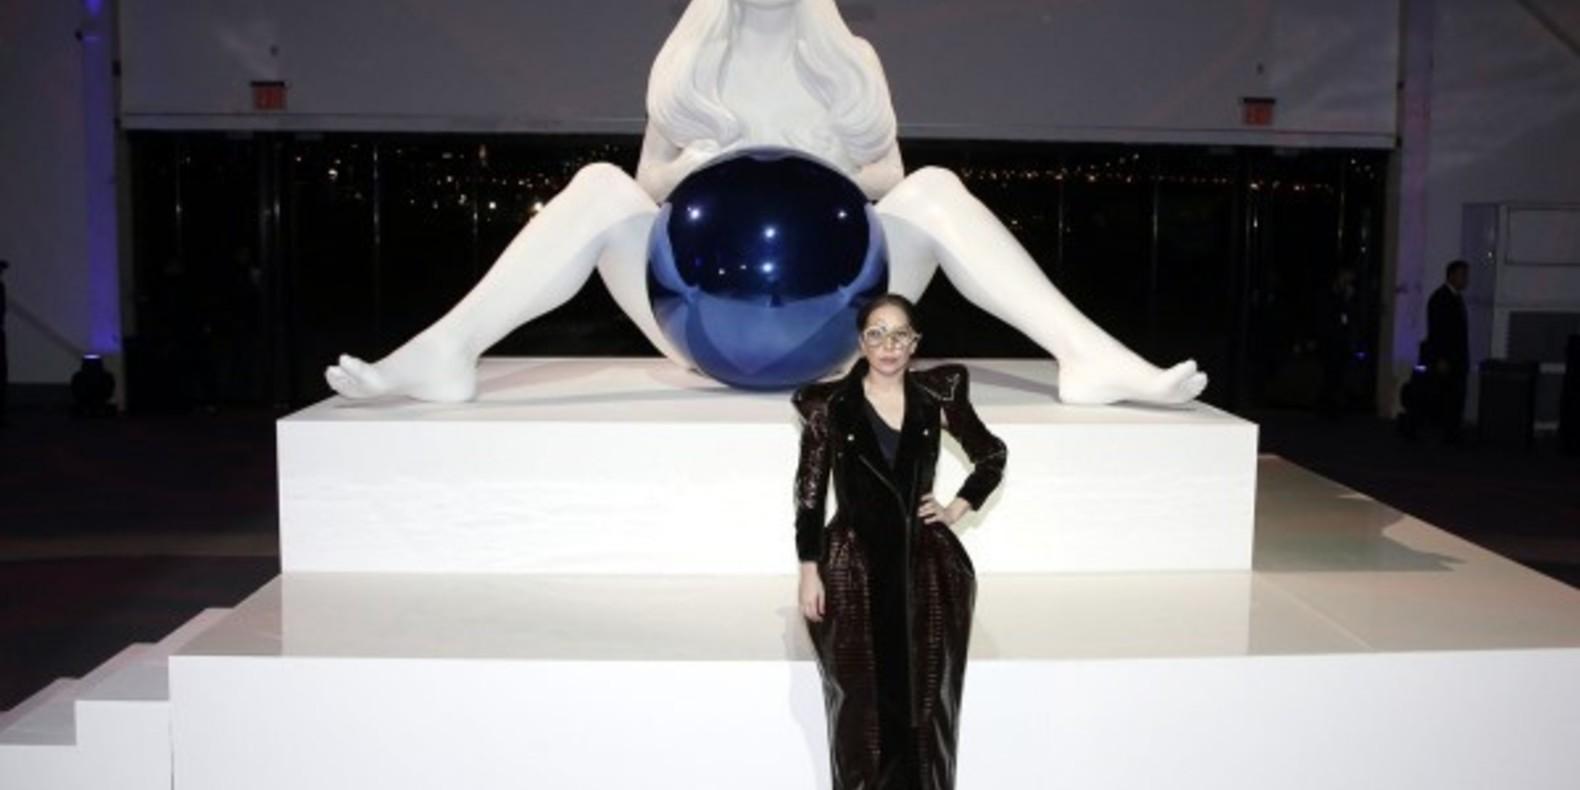 cults lady gaga robe imprimée en 3D mode artpop materialise studio XO scanning 3D musique Art Rave fashion fichier 3d jeff koons scott eaton